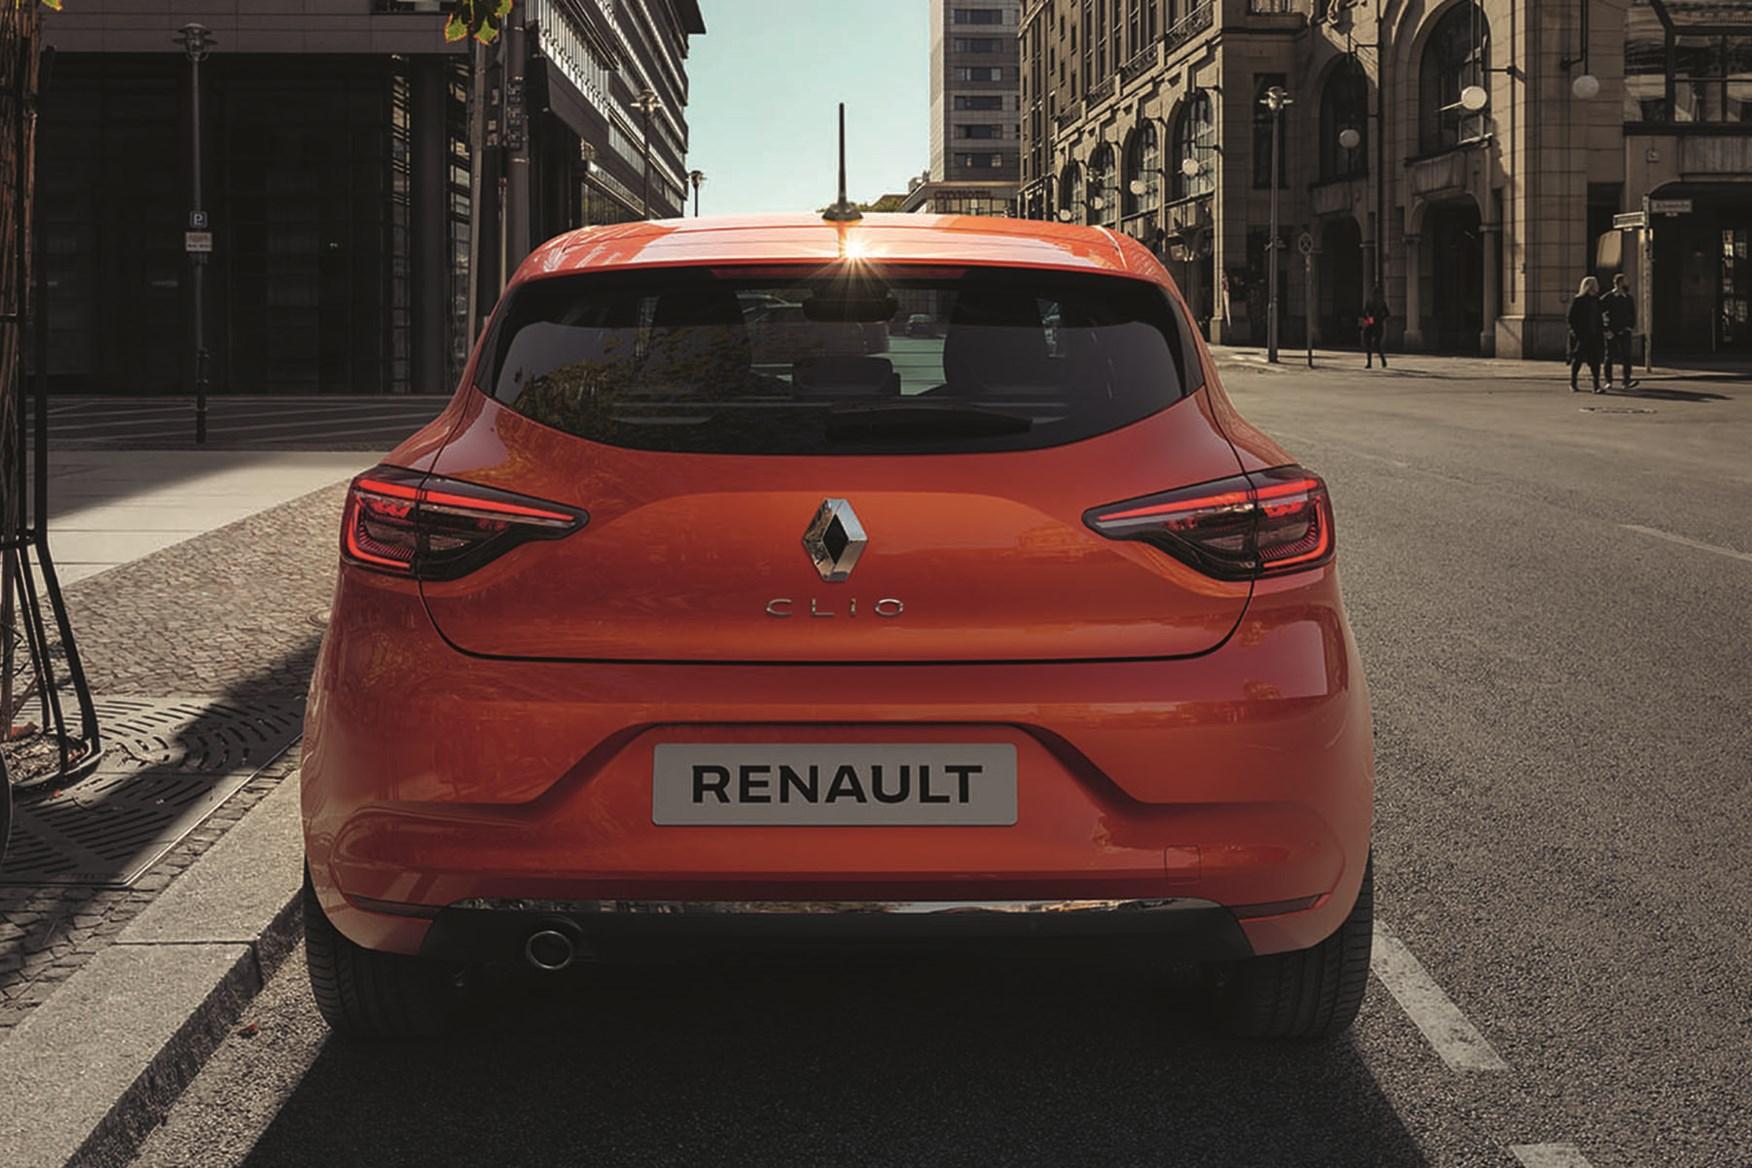 Renault Clio 2019 Parkers